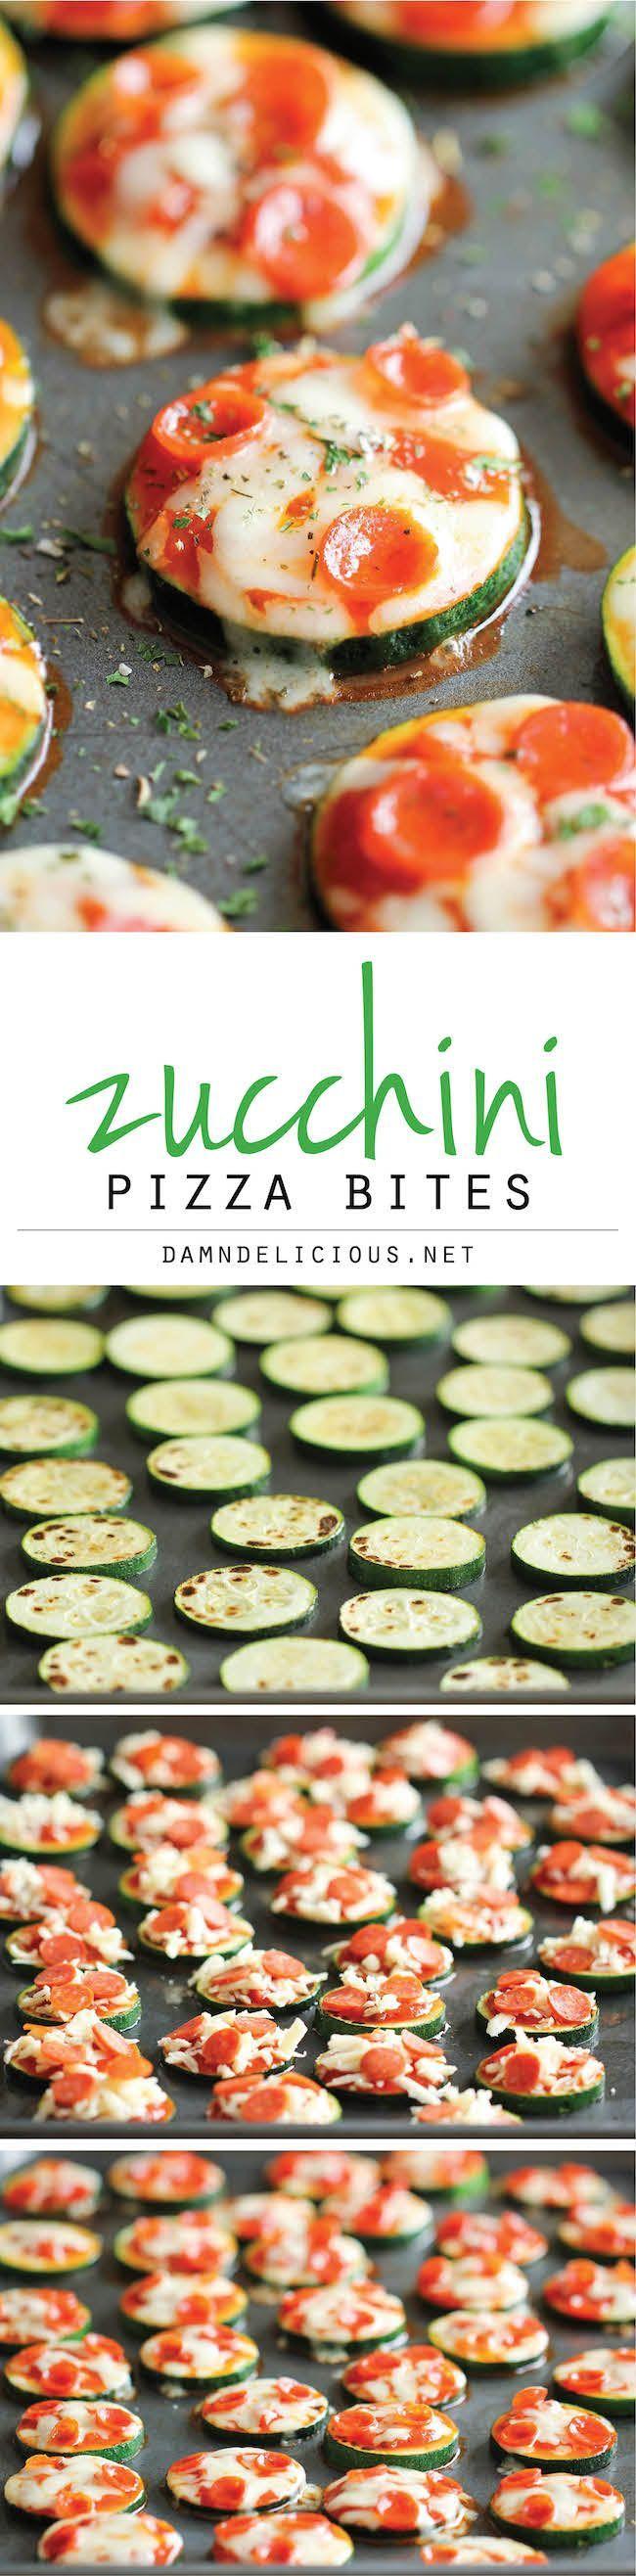 Gluten-Free Zucchini Pizza Bites Recipe